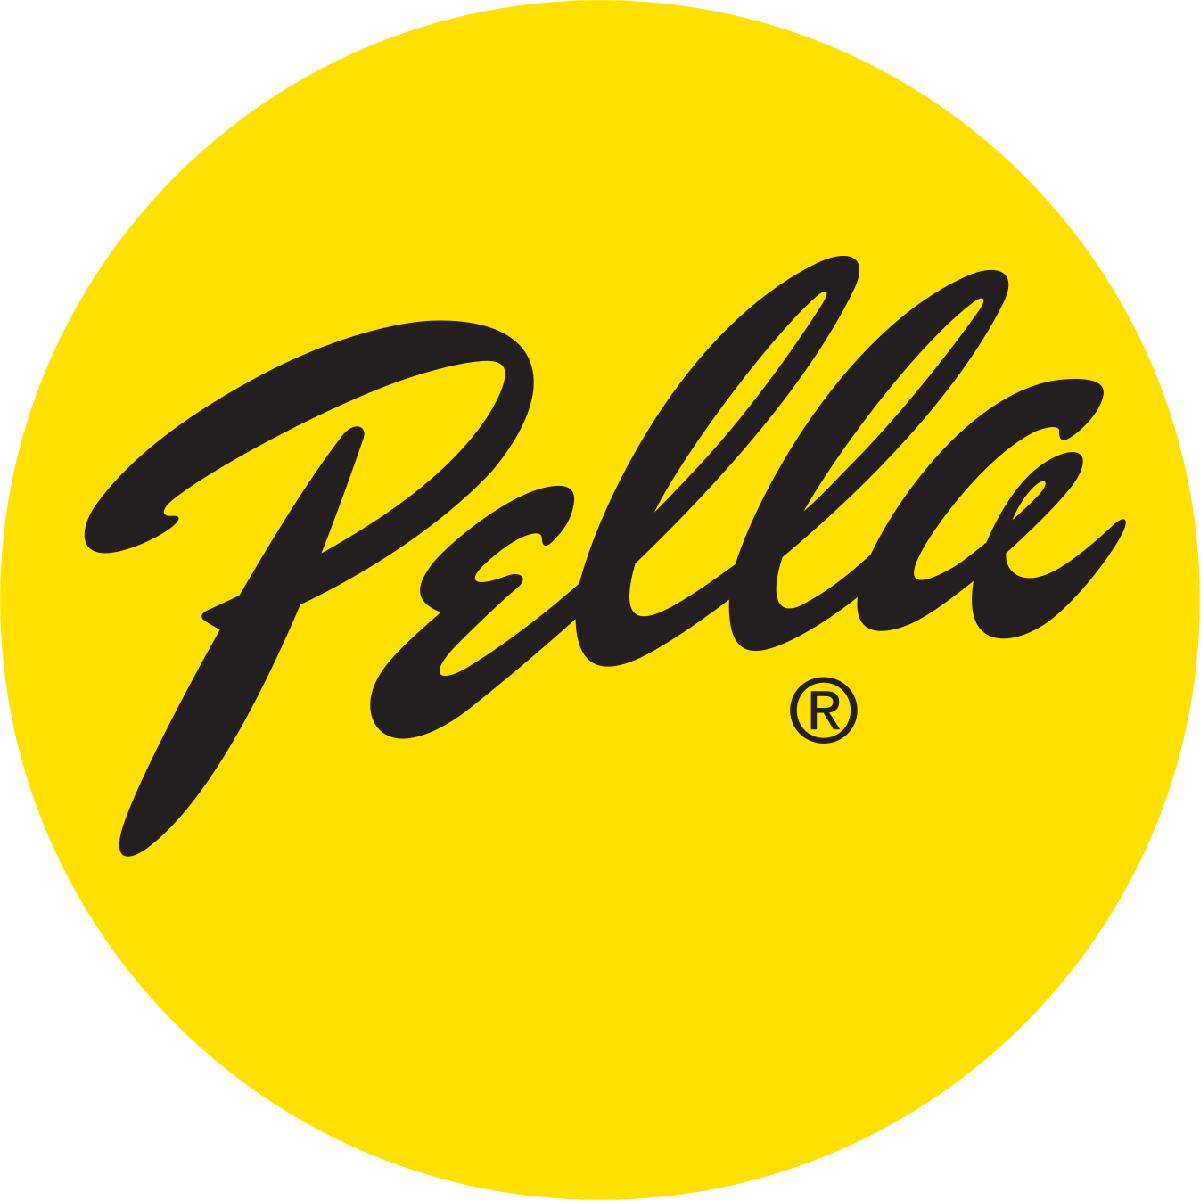 Pella Windows & Doors logo